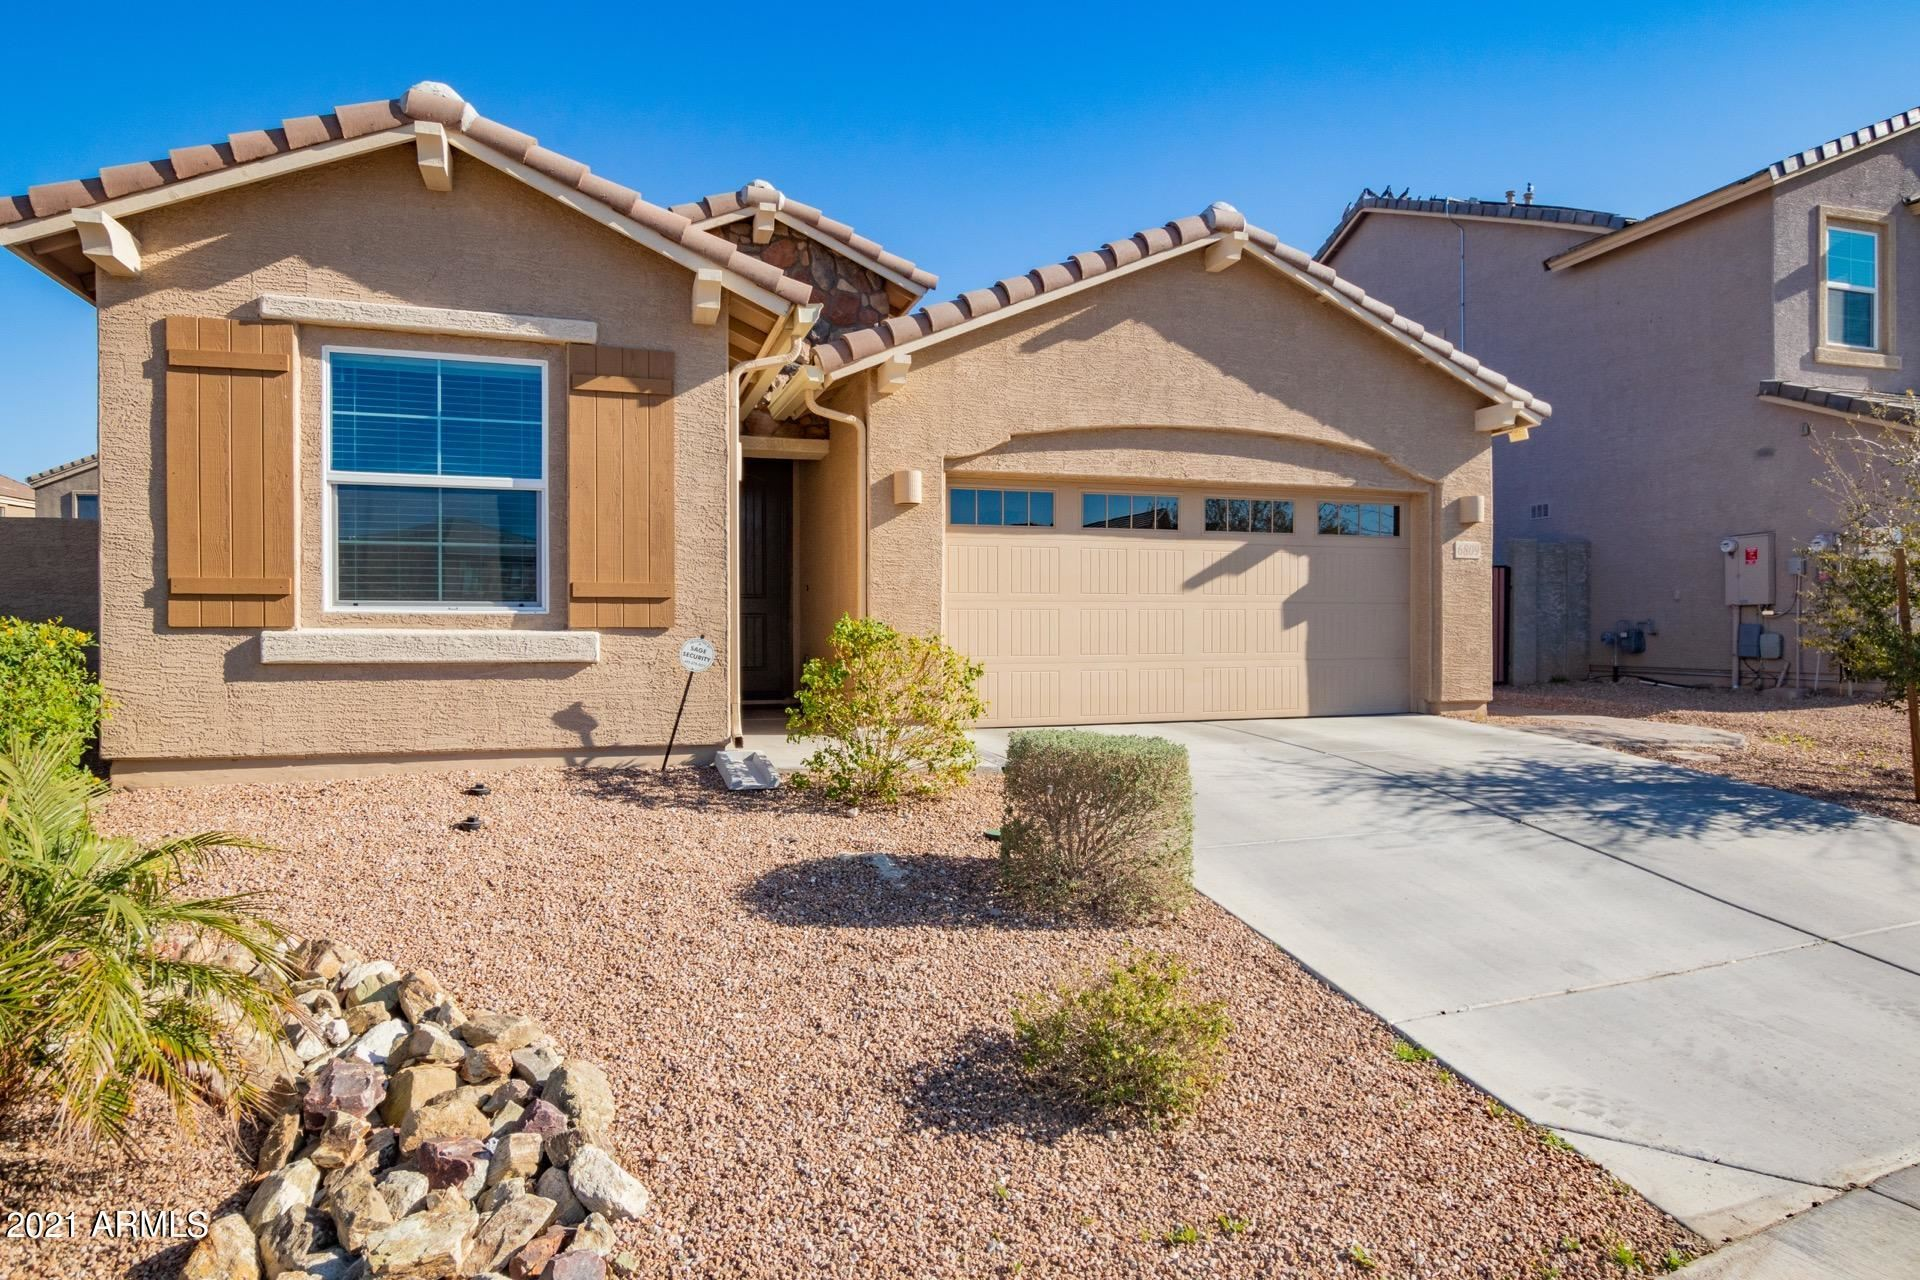 Photo of 6809 N 130TH Drive, Glendale, AZ 85307 (MLS # 6200262)